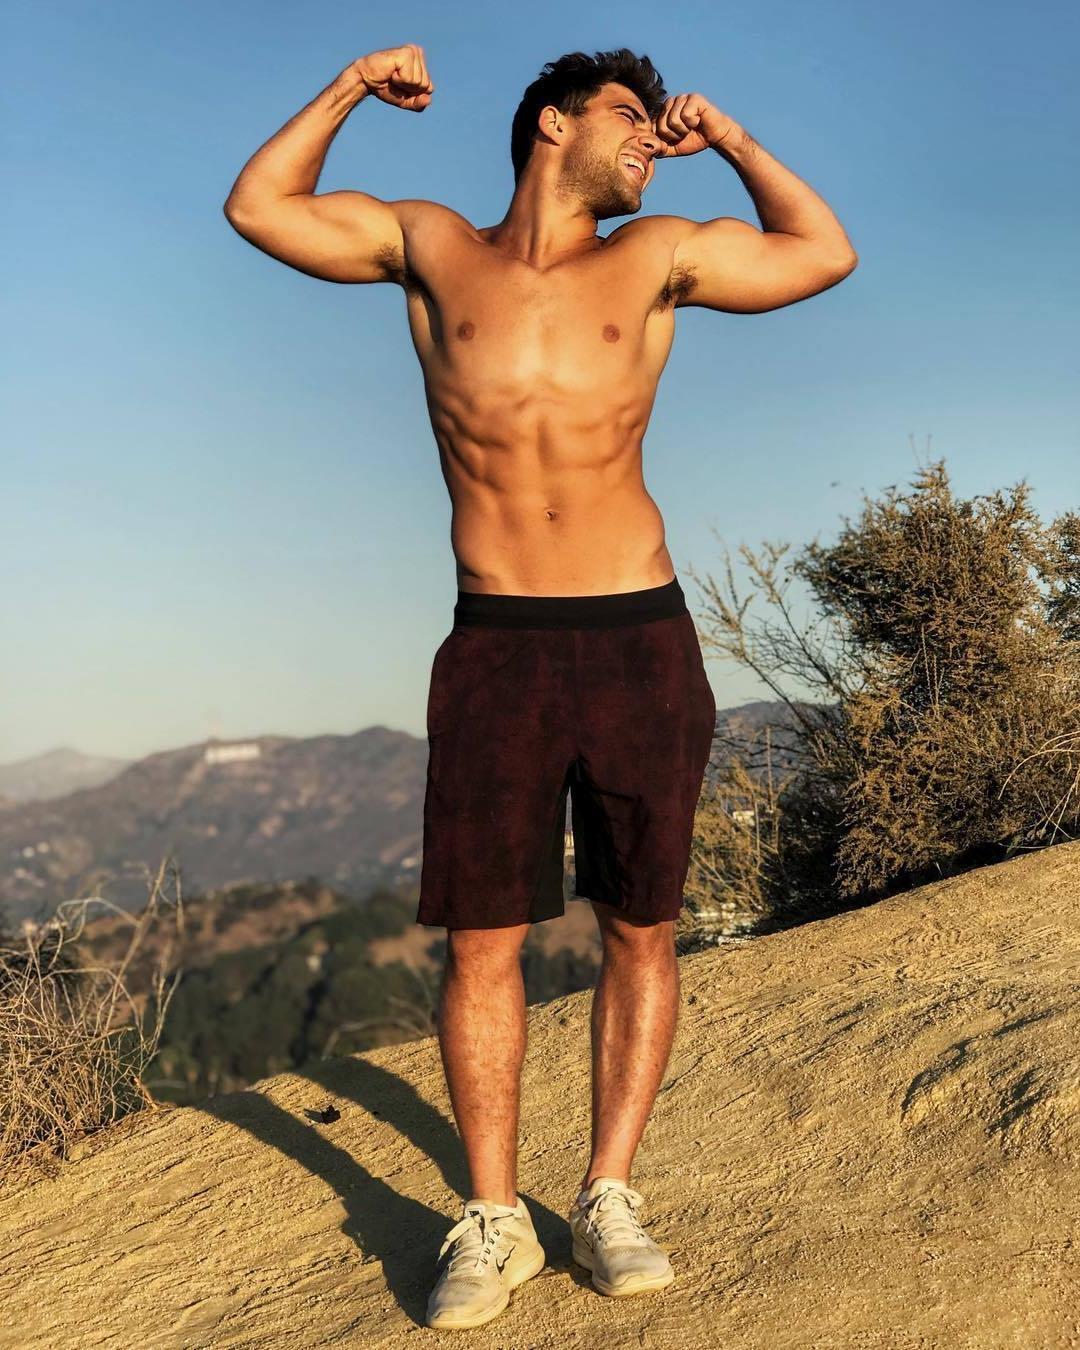 adorable-shirtless-slim-fit-gay-twink-hairy-armpits-biceps-flex-yawning